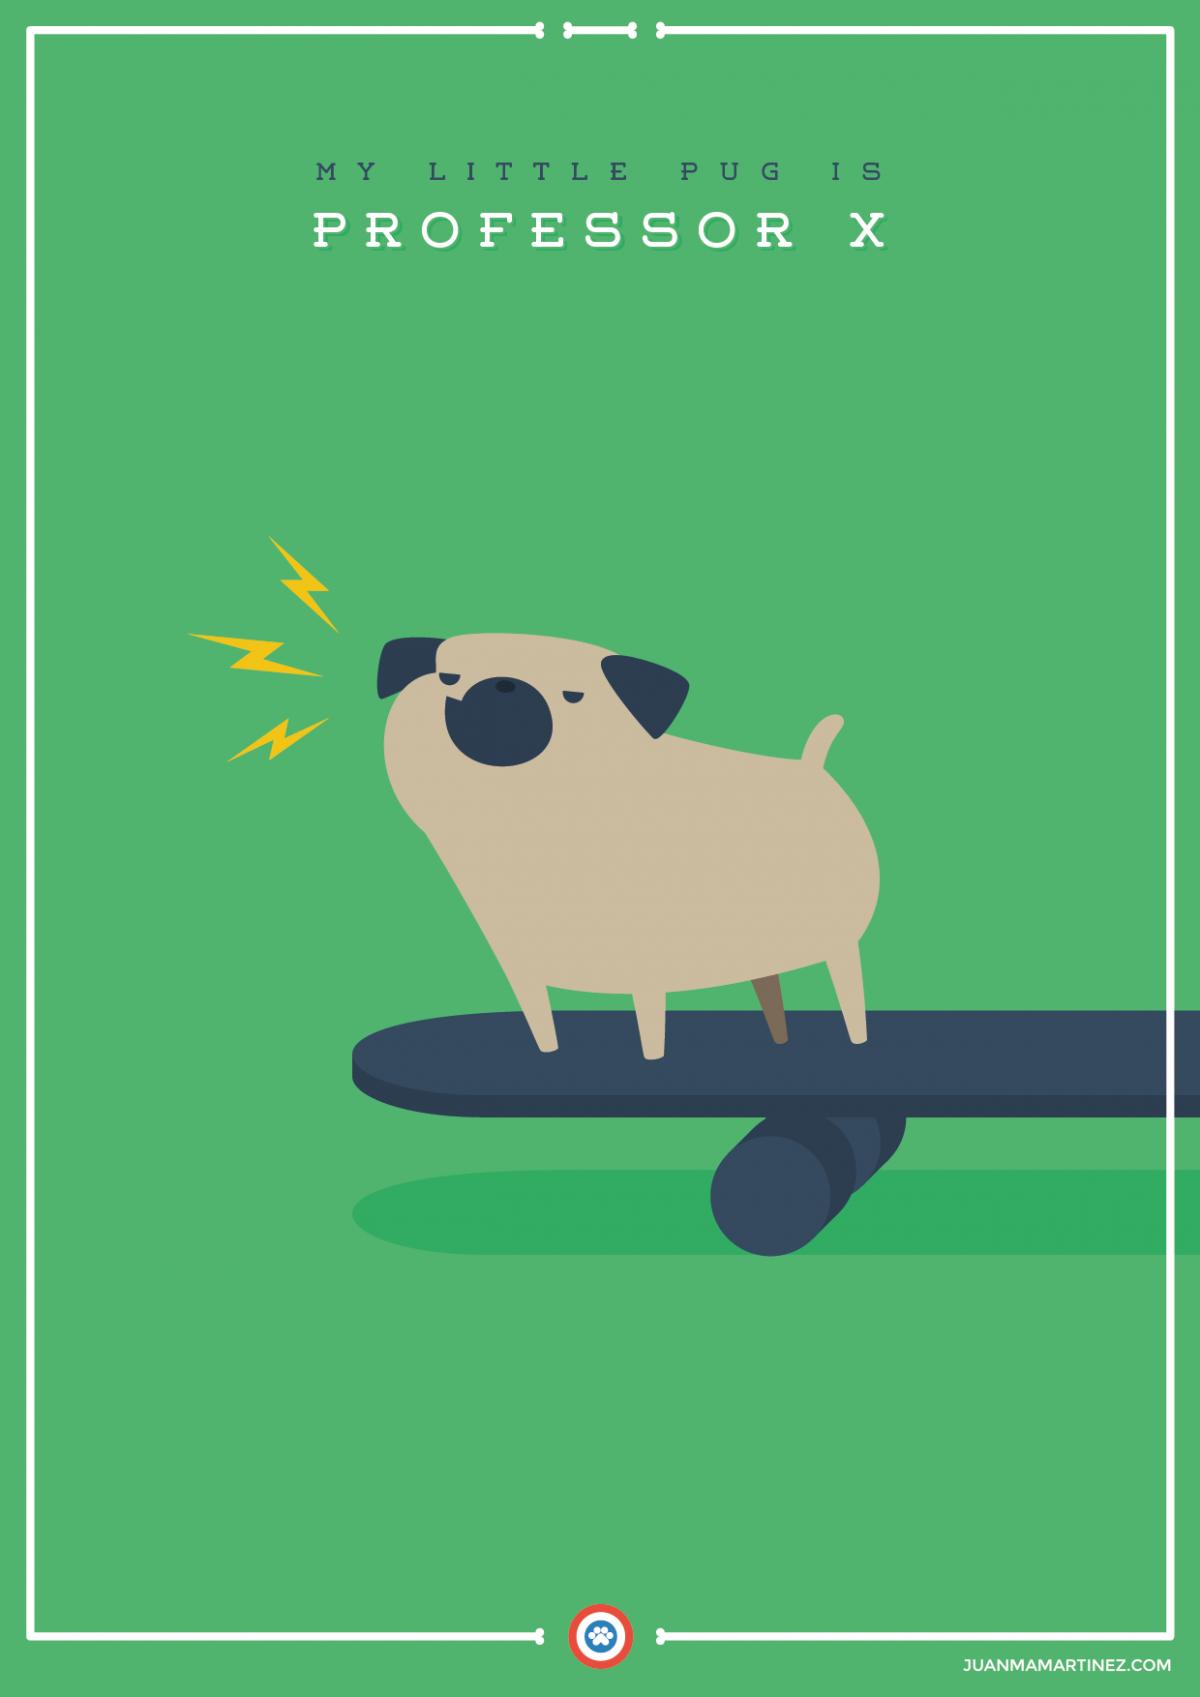 extraordinary-doggies-illustration-2